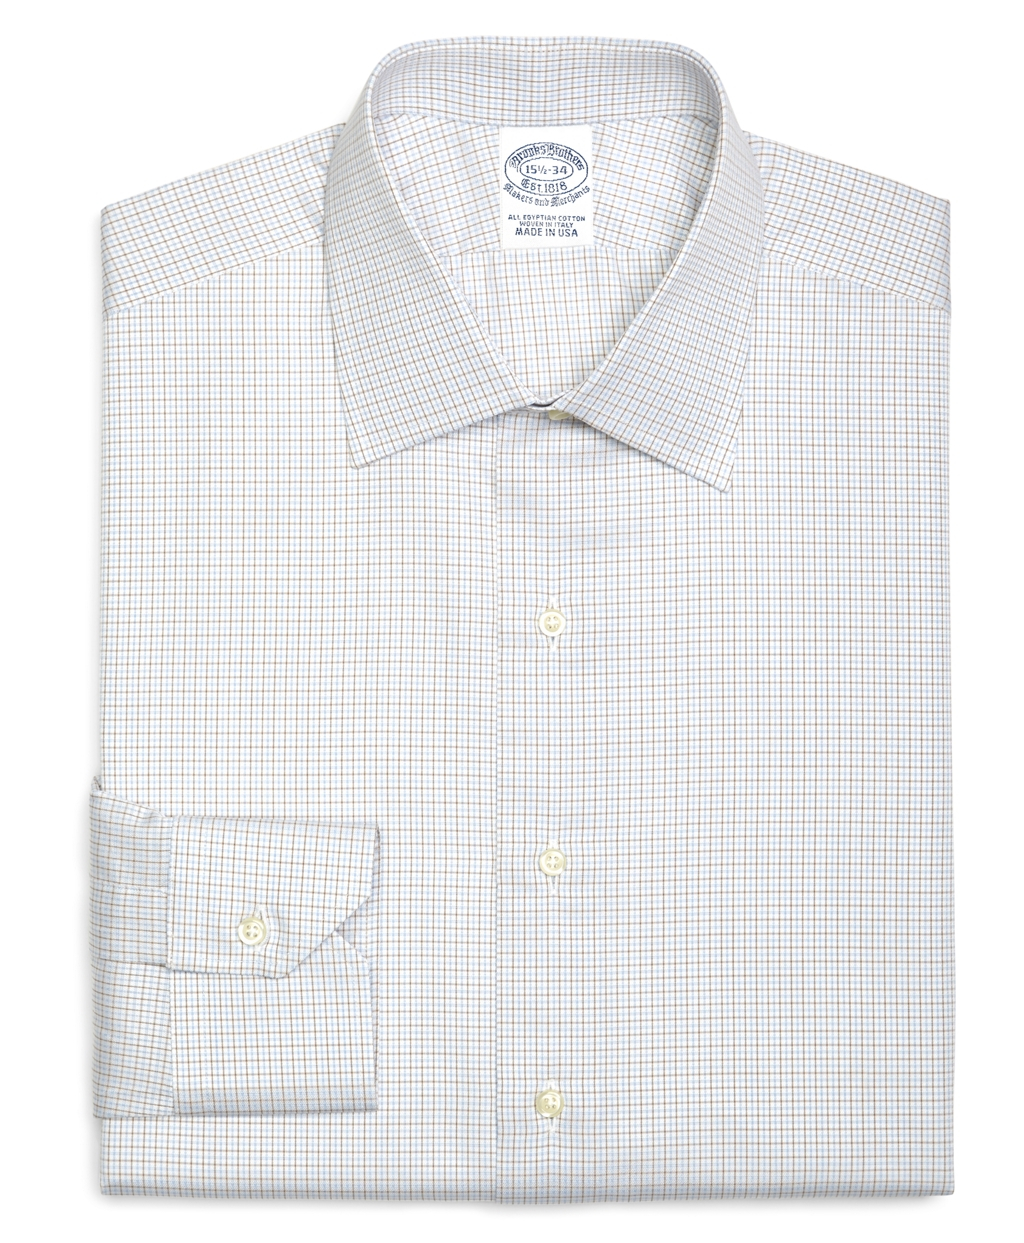 Brooks brothers regular fit small tattersall dress shirt for Small collar dress shirt